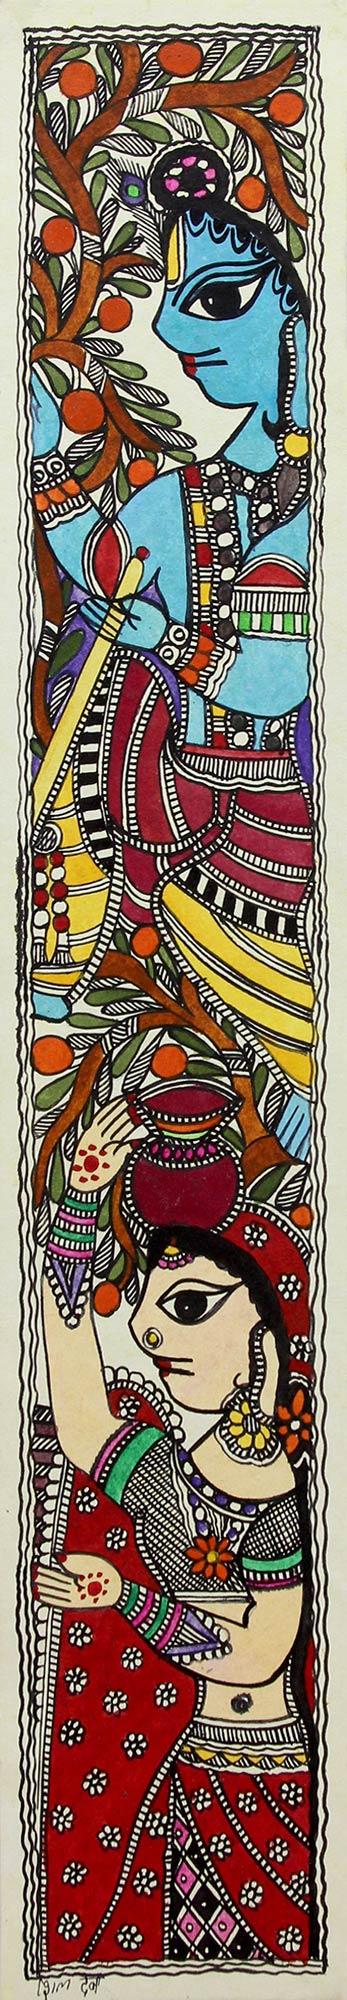 Krishna & Radha Madhubani Hindu Painting on Handmade Paper